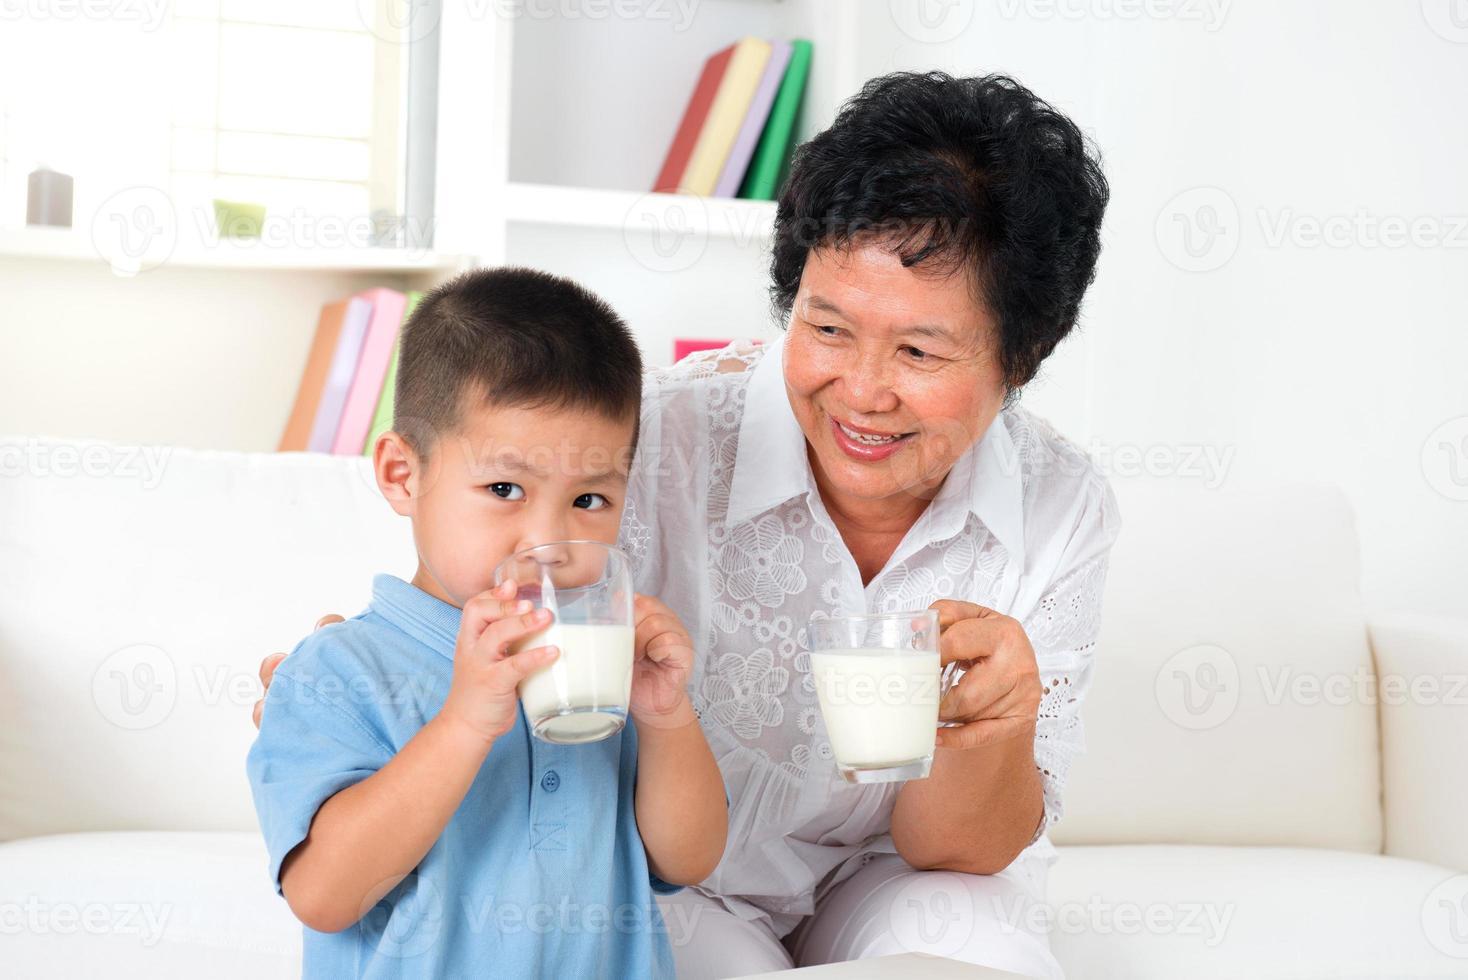 samen melk drinken foto